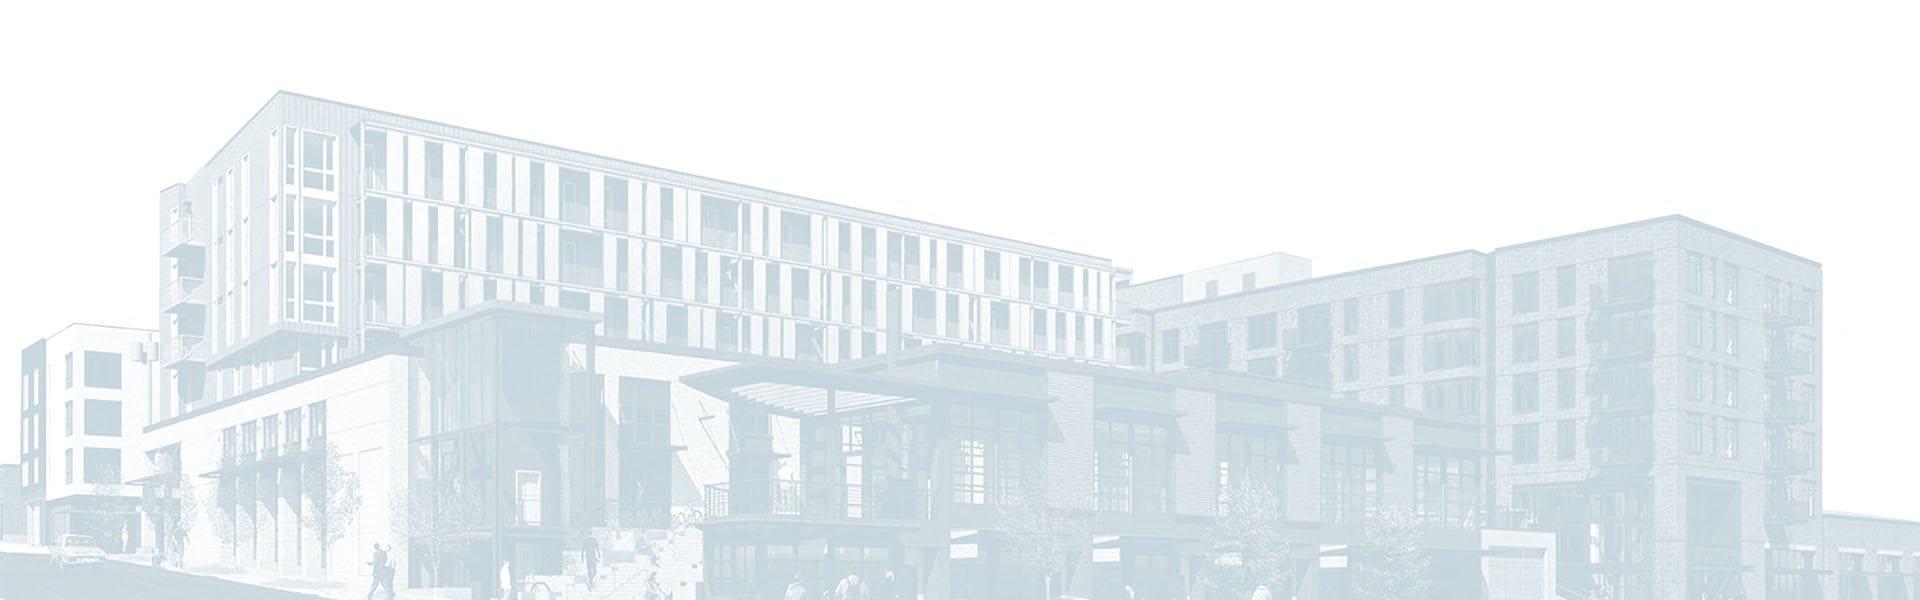 Drawing of Goat Blocks Building Exterior